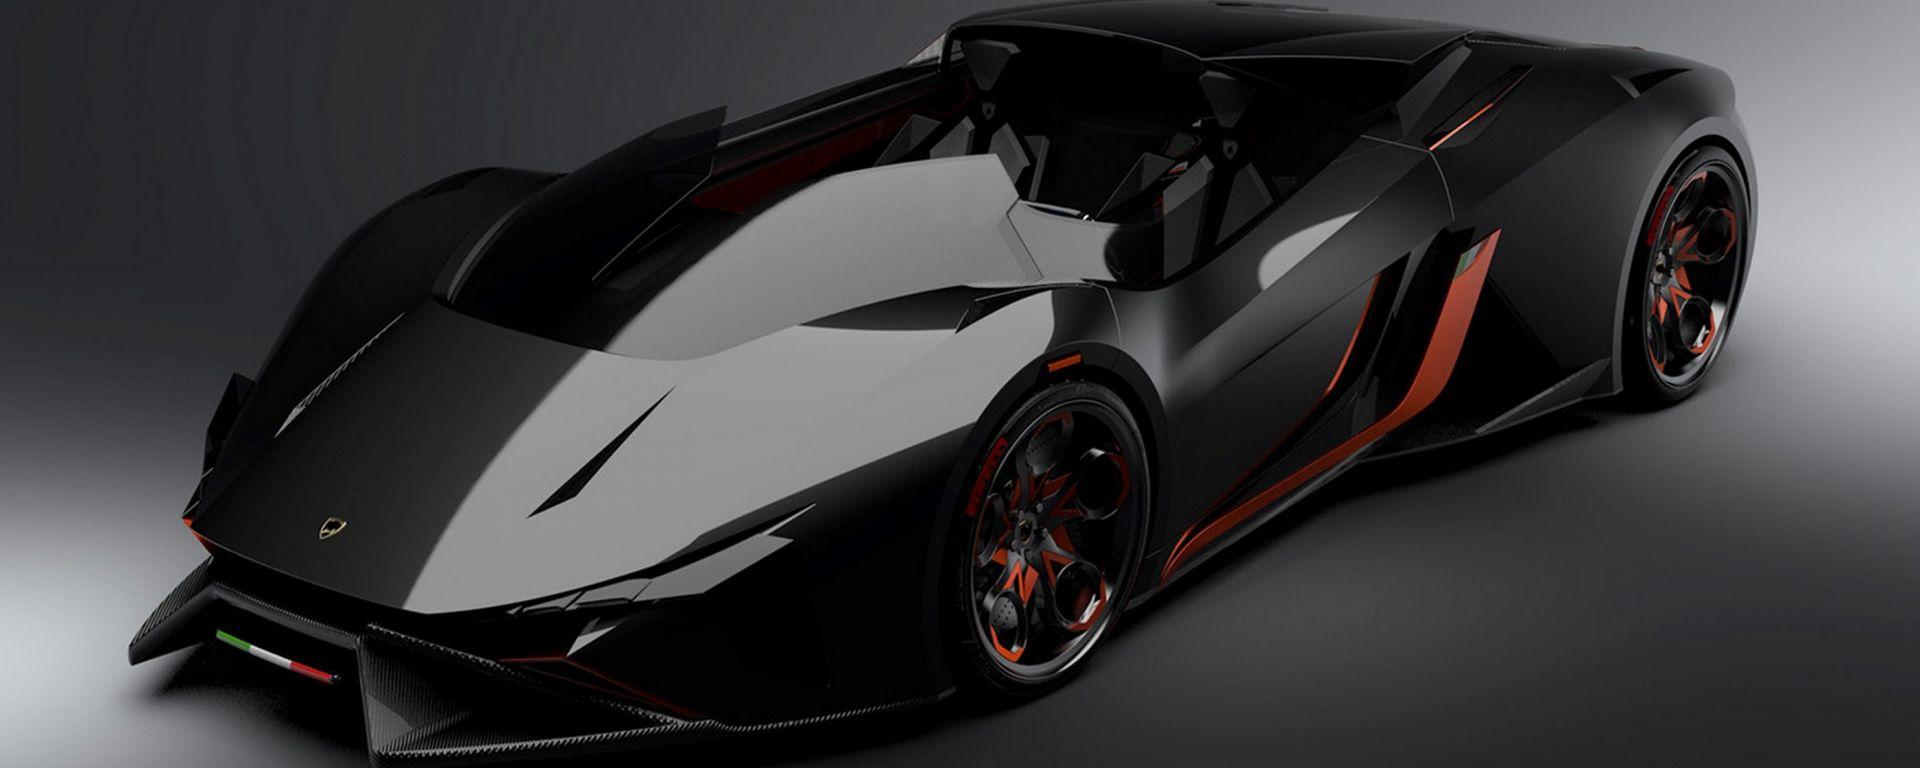 Lamborghini elettrica: quando arriva?